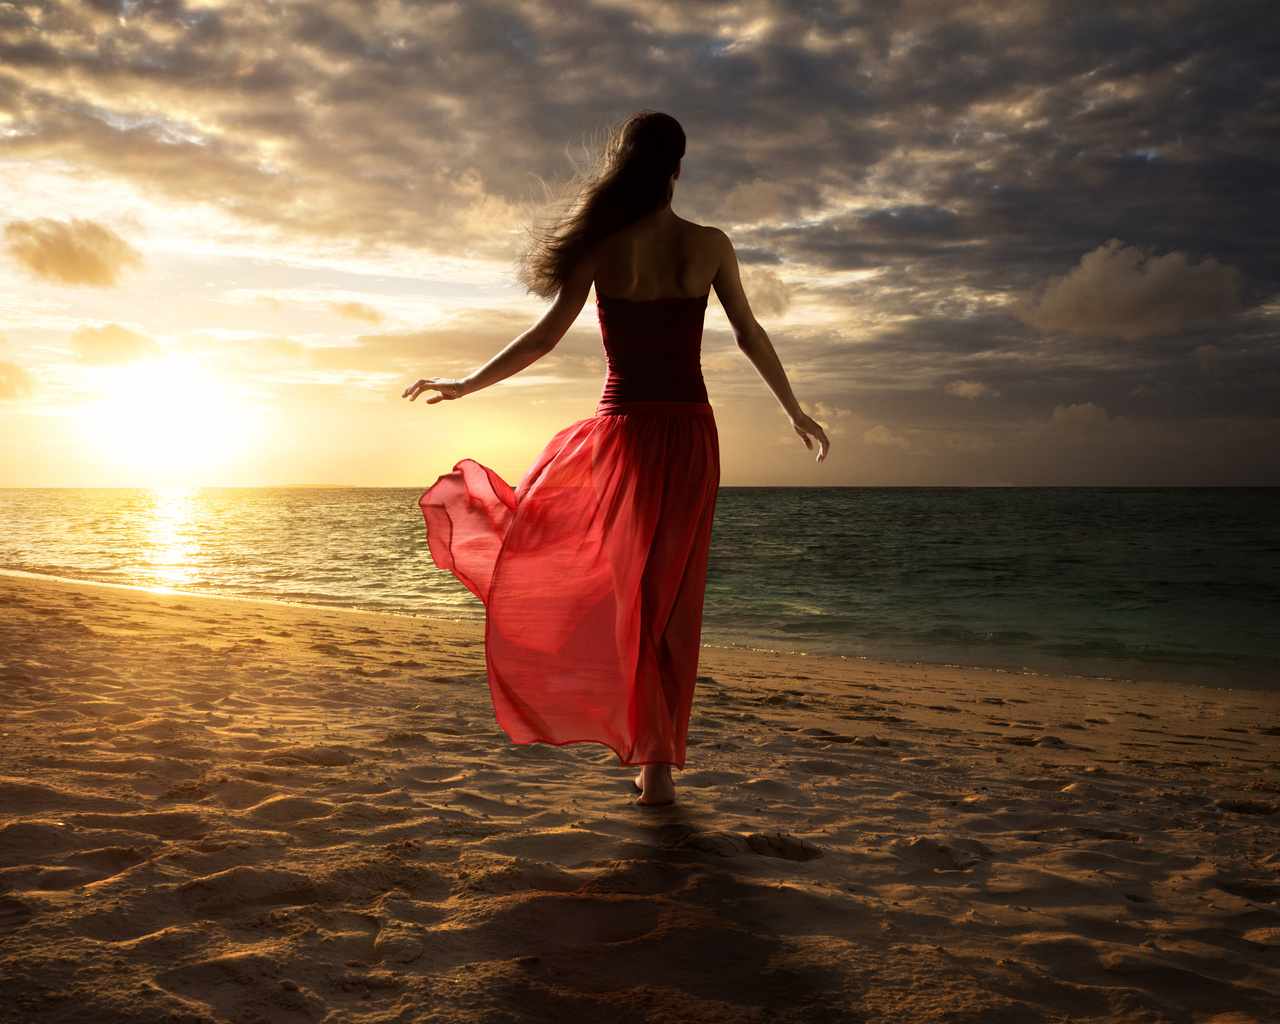 Фото девушки в платье на берегу